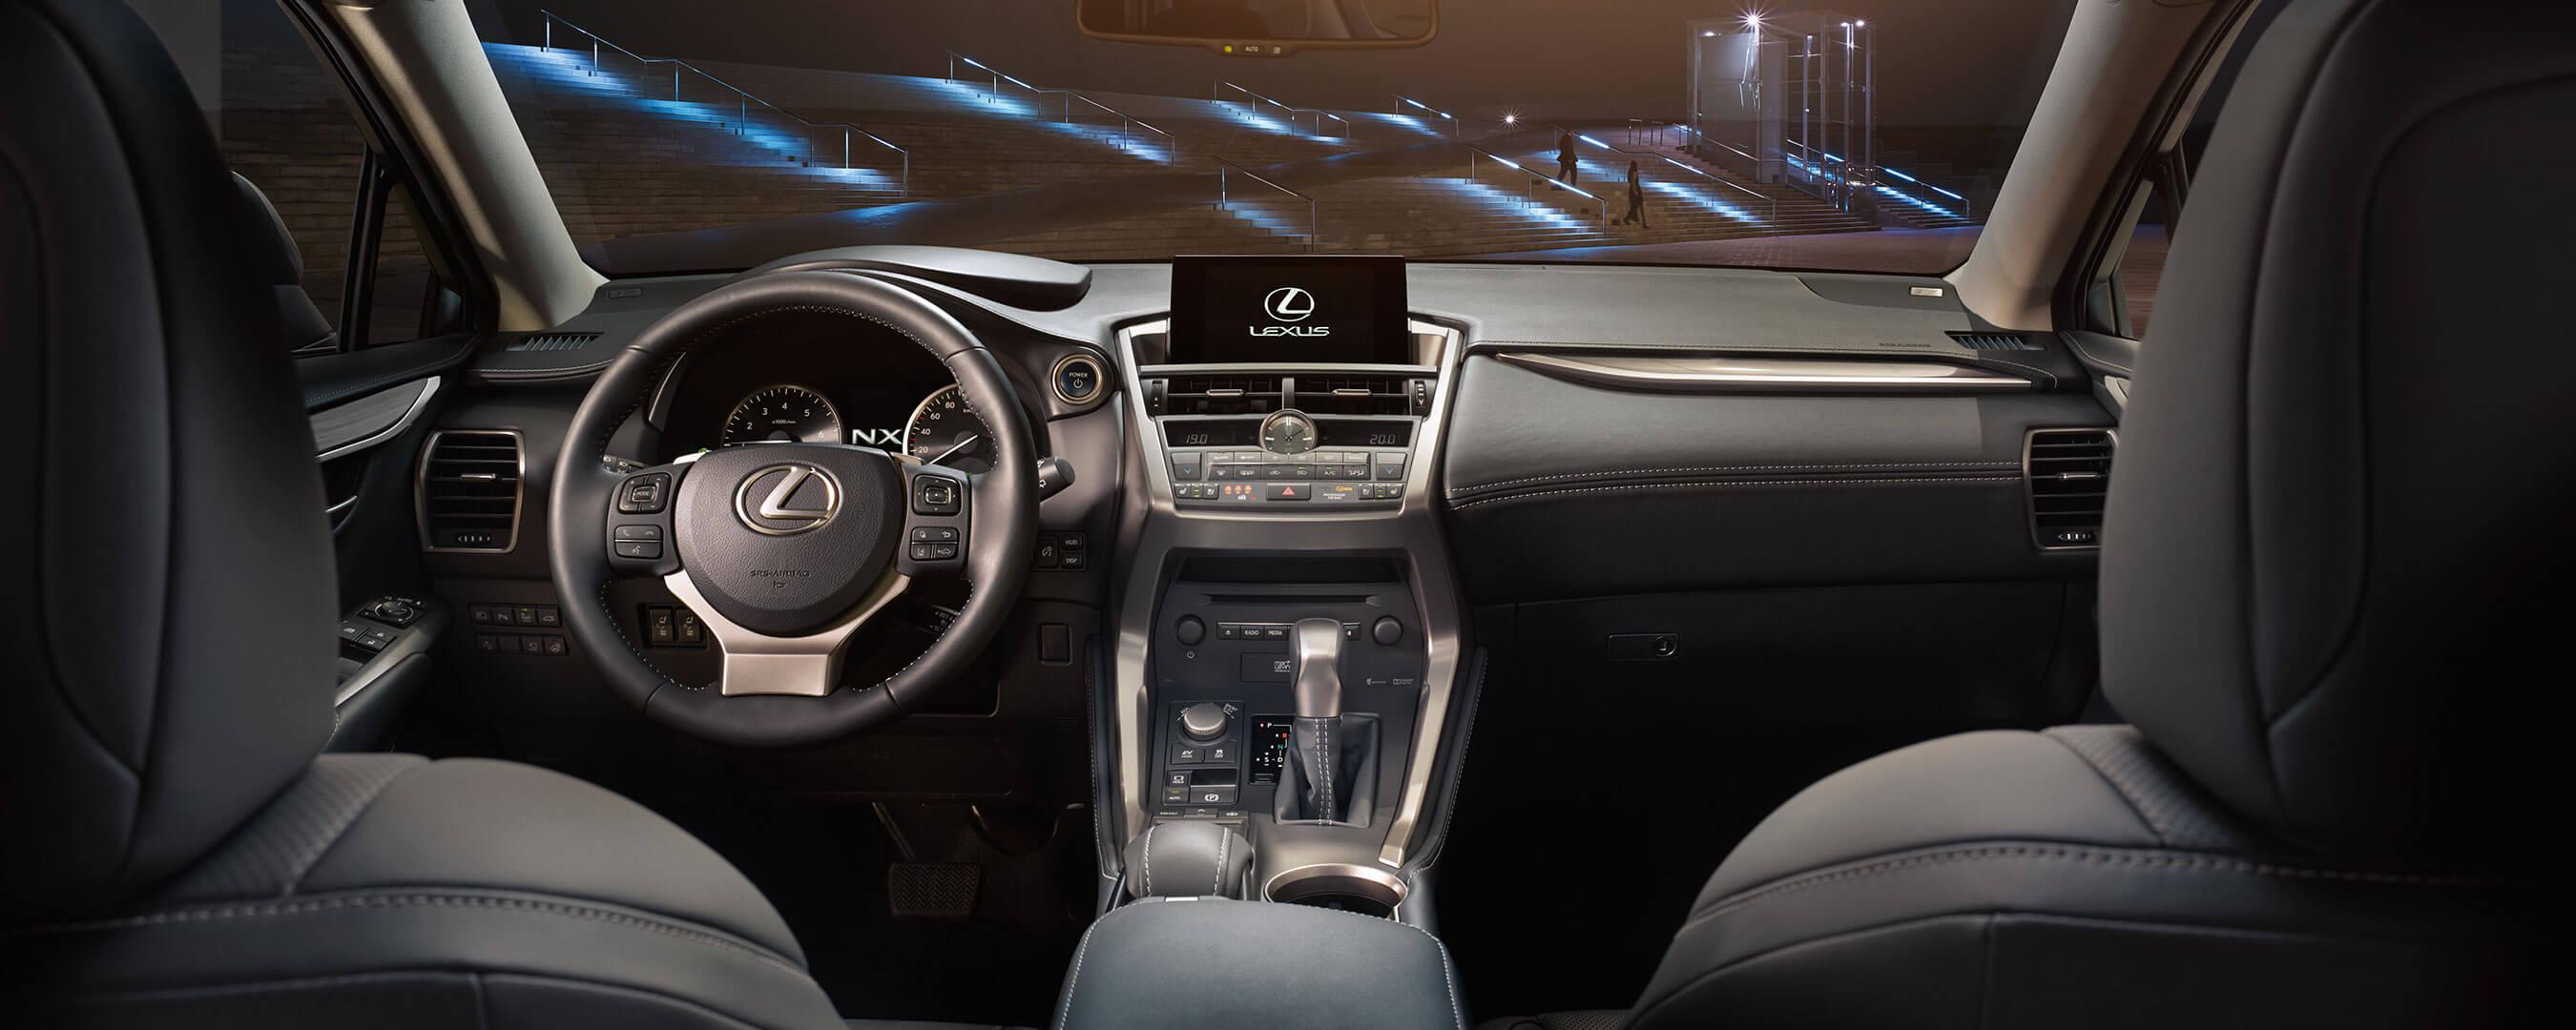 2017 lexus nx 300h experience hero interior front